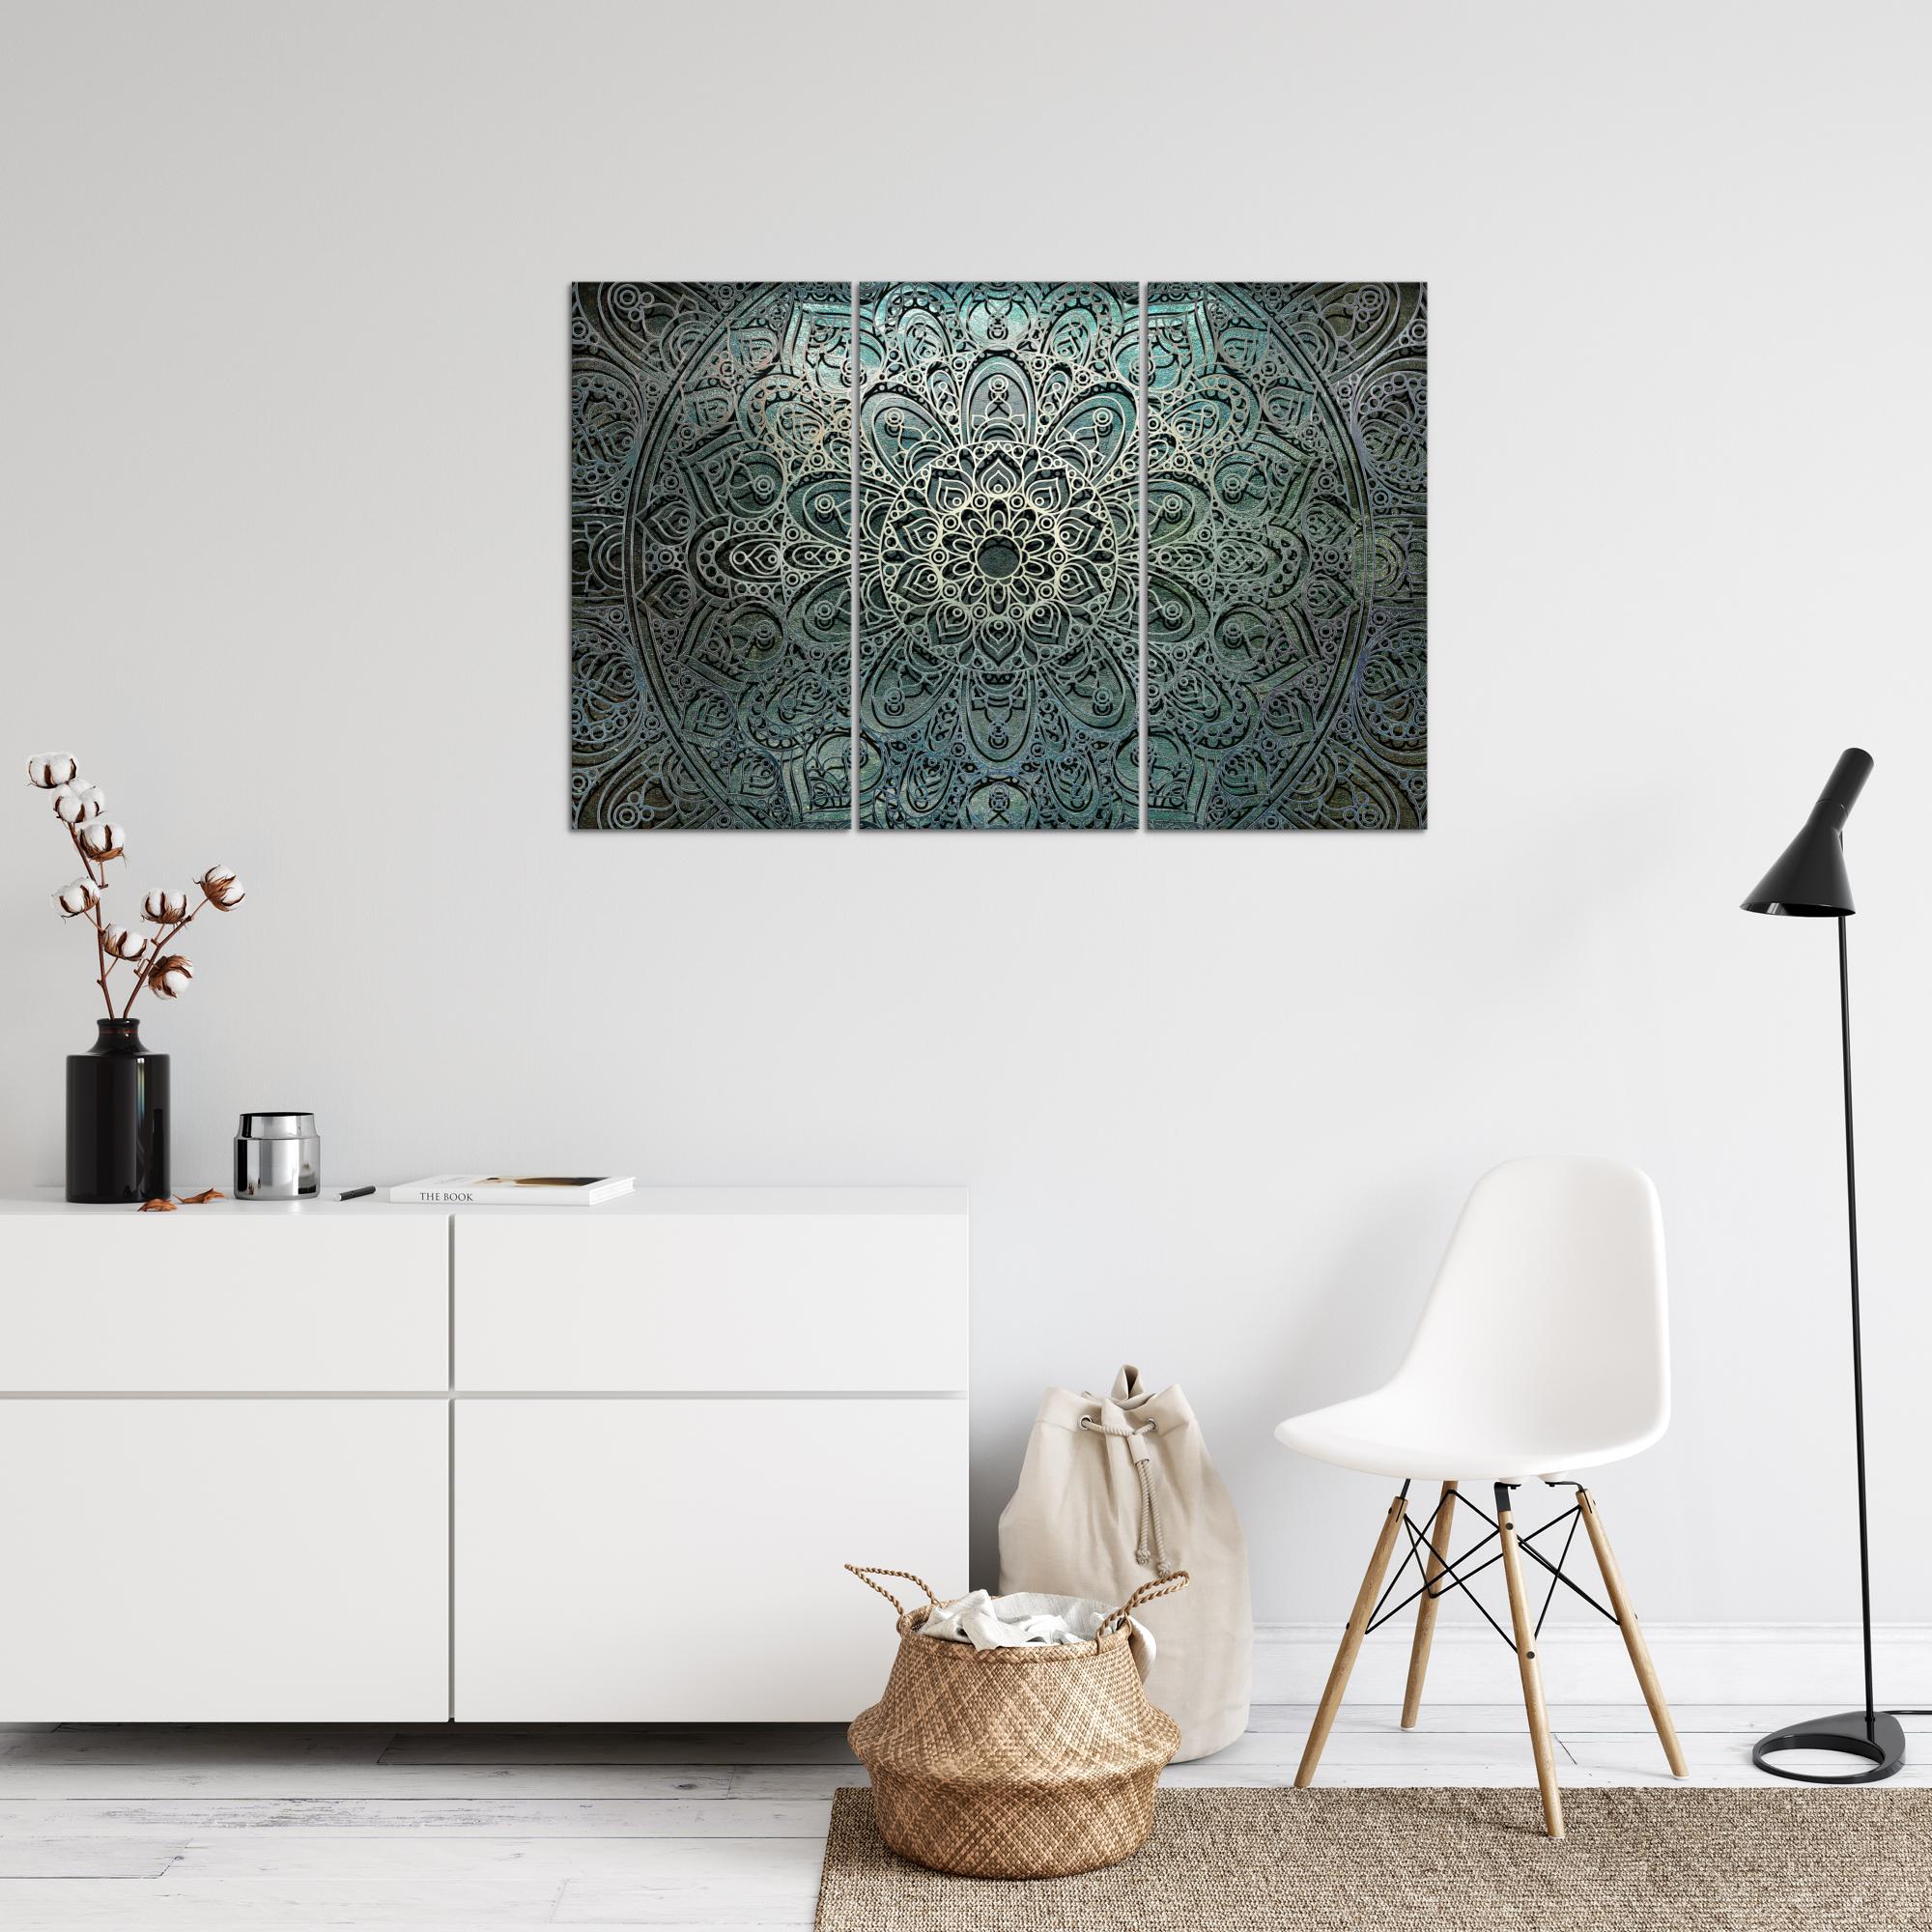 Mandala Abstrakt Bild Kunstdruck Auf Vlies Leinwand Xxl